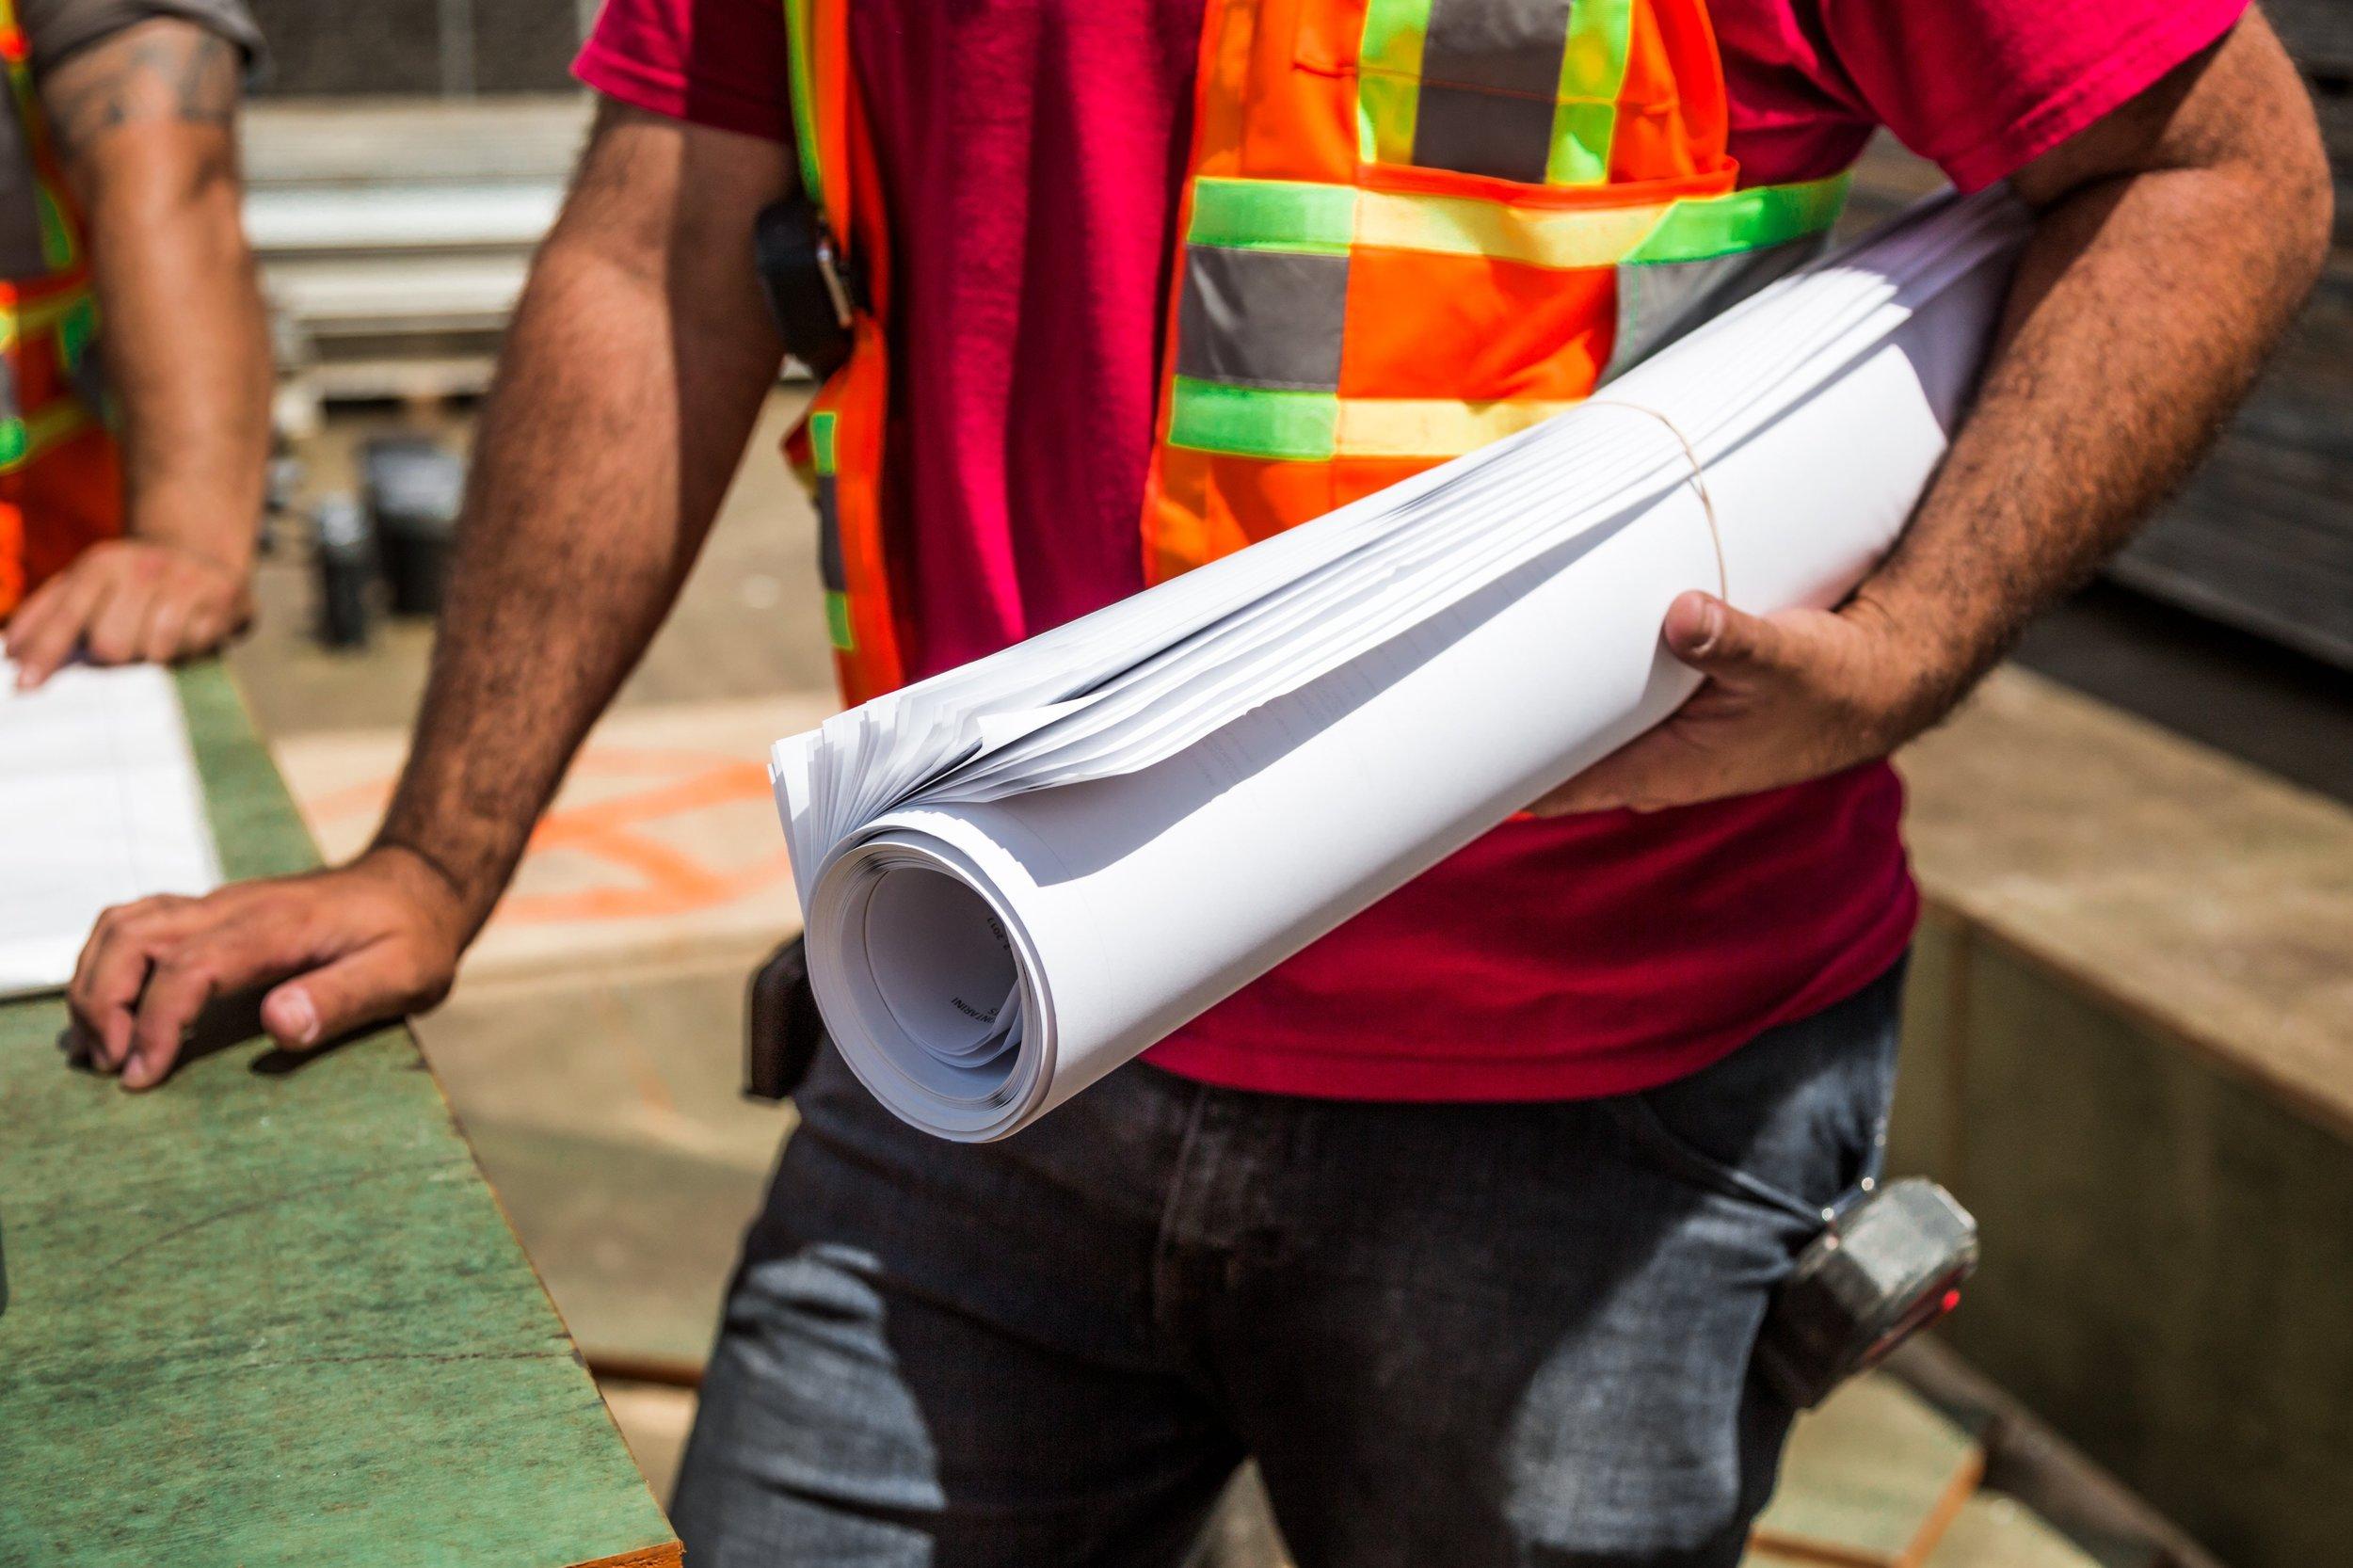 construction-workers-daylight-men-544971.jpg